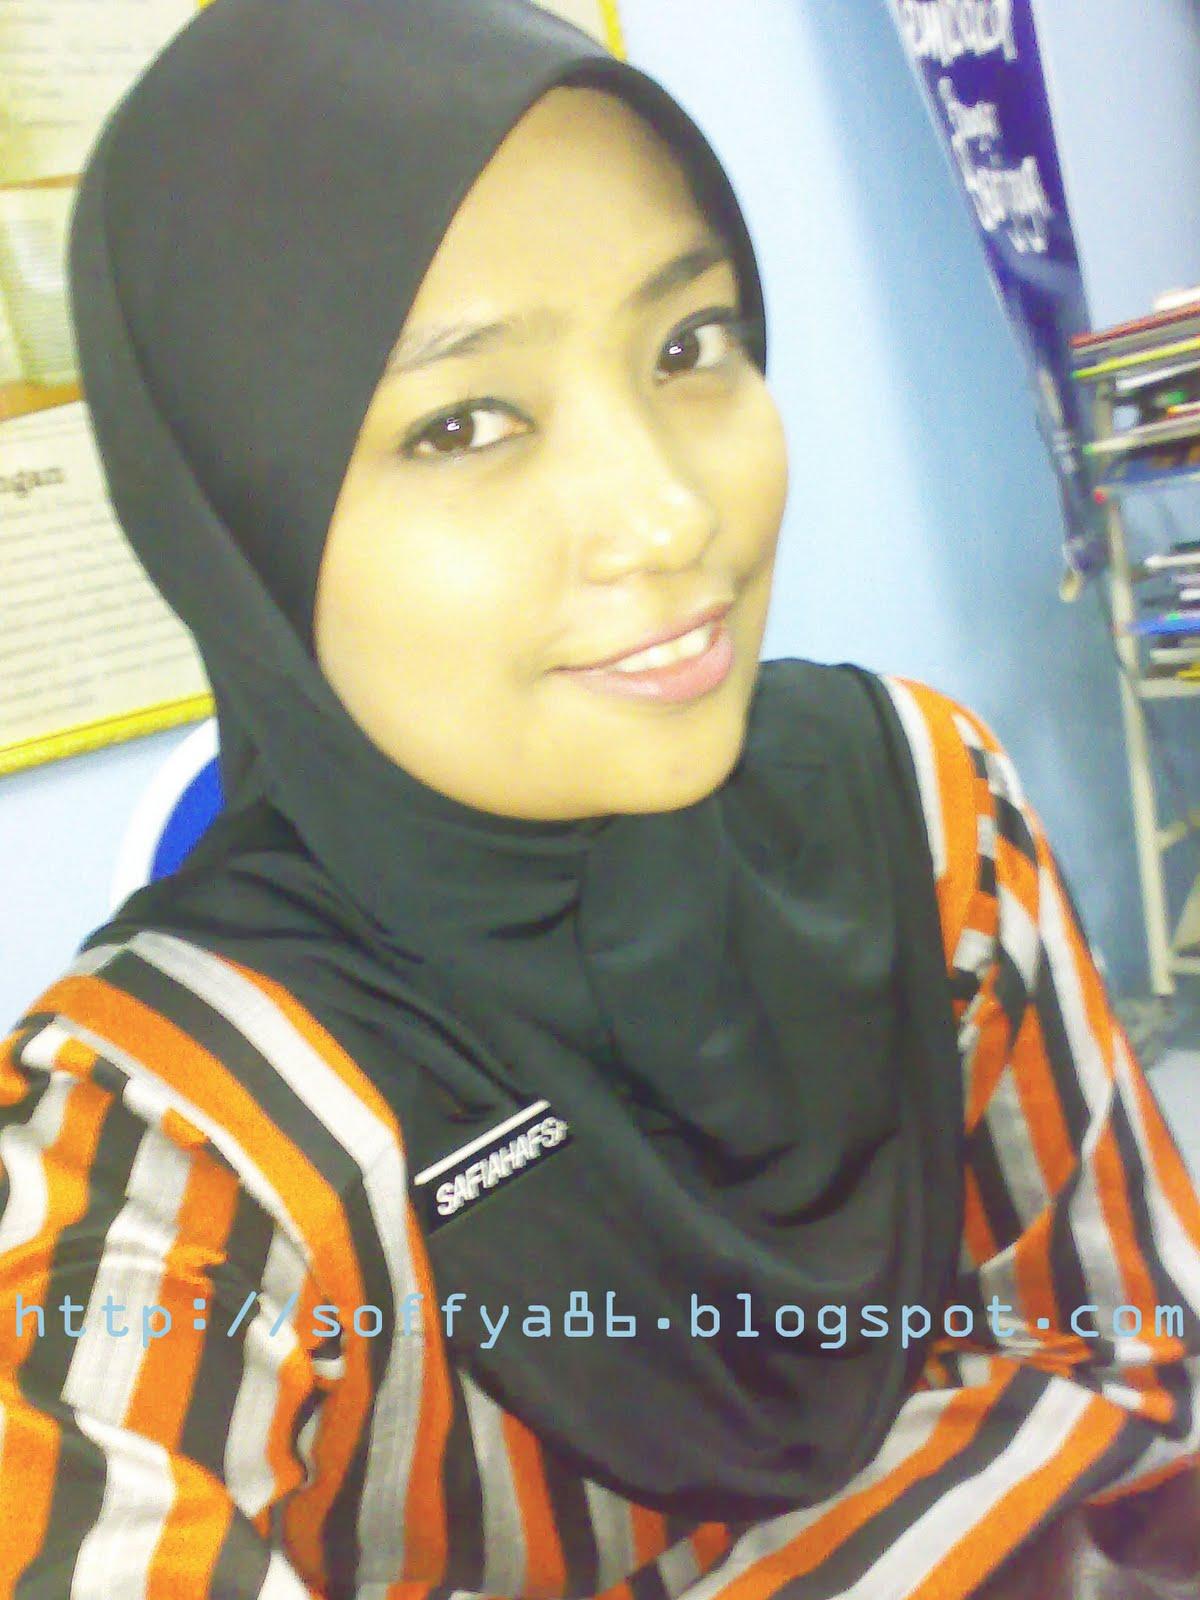 Sex Melayu Perempuan Blogspot Xxx Cerita Seri Bogel Jpg 1200x1600